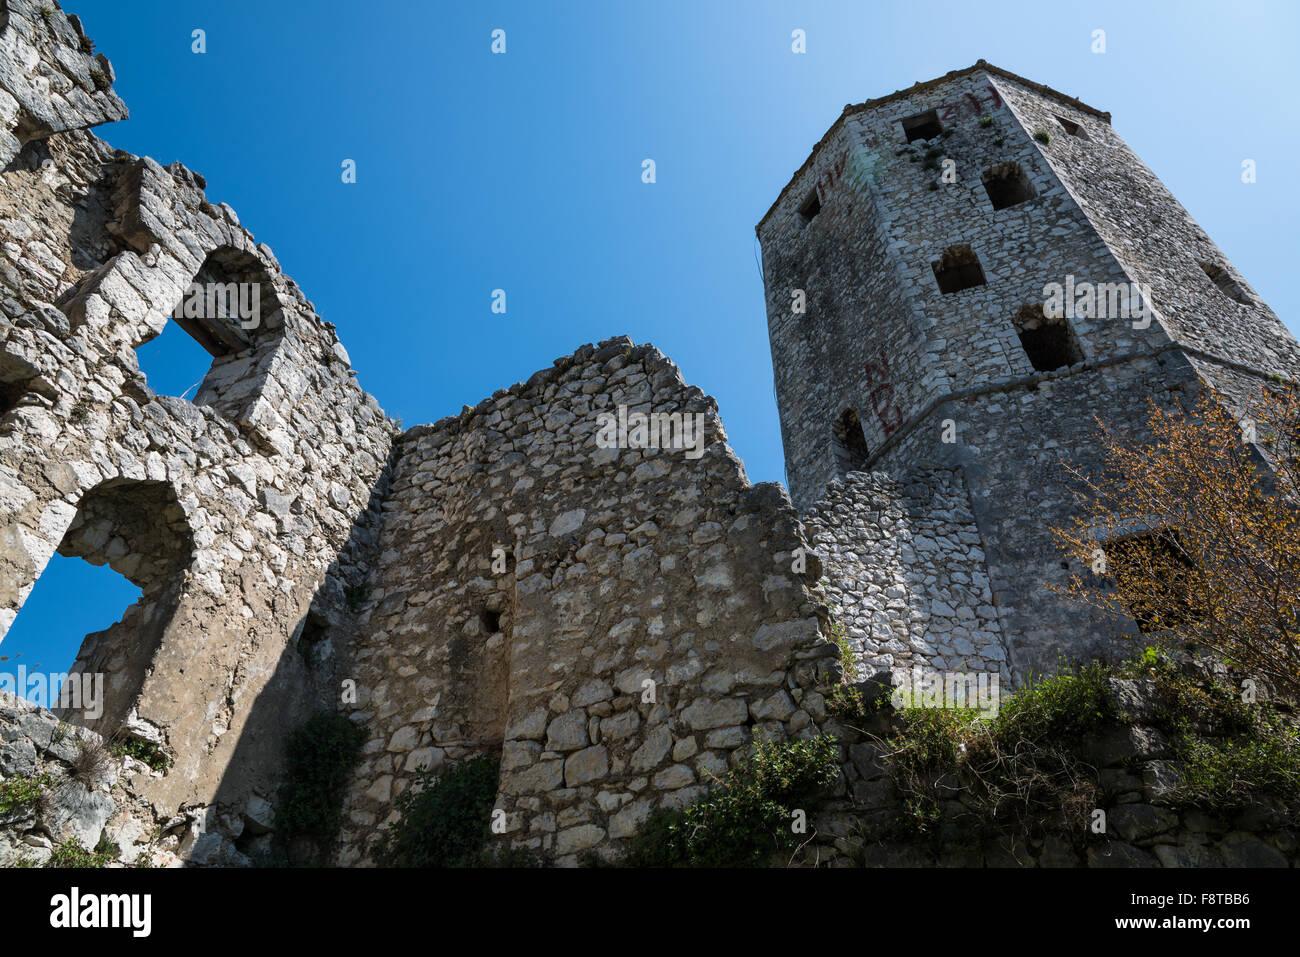 The castle of Pocitelj, Bosnia and Herzegovina Stock Photo